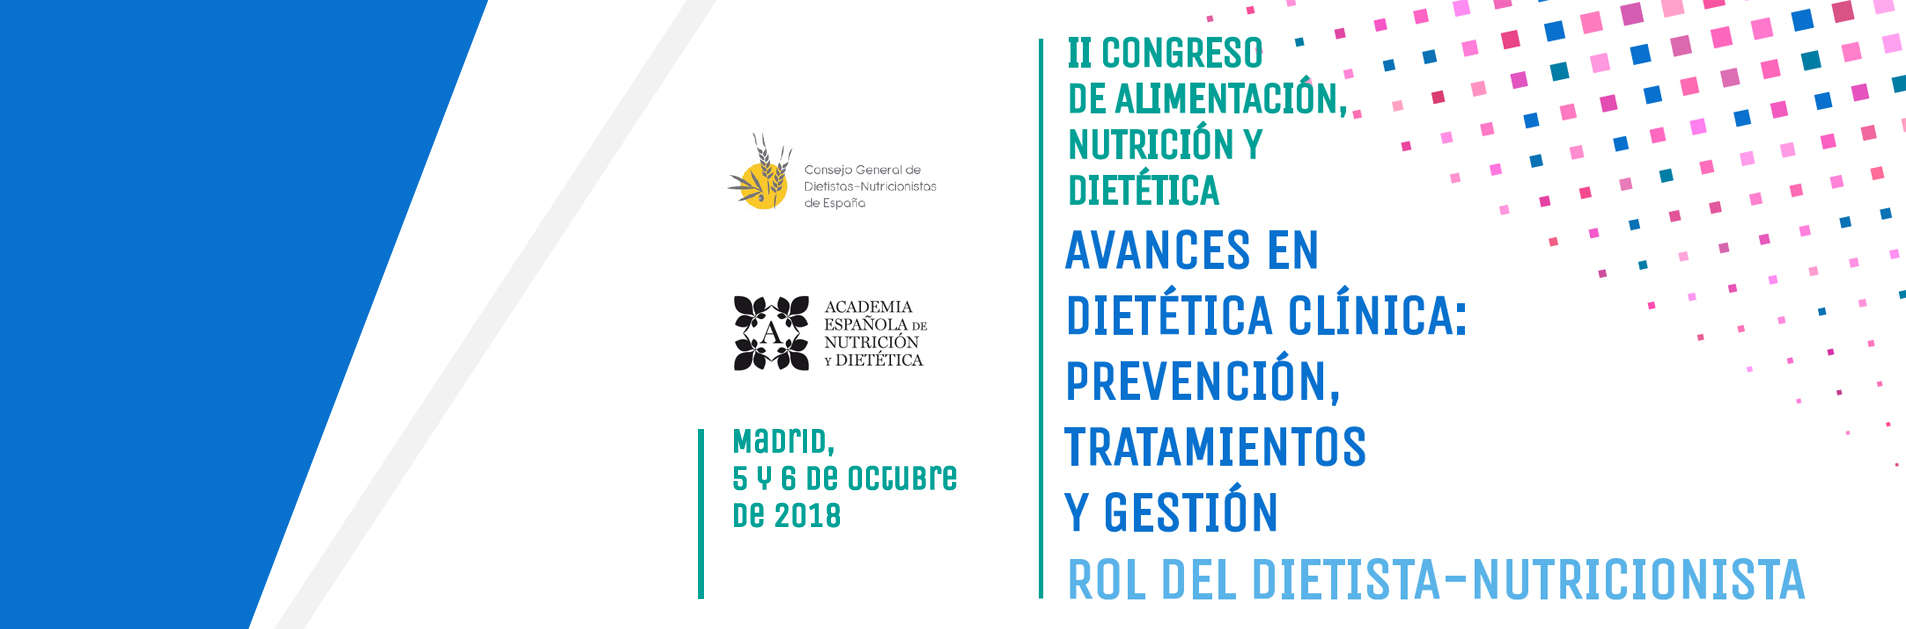 congreso-alimentacion-madrid-2018